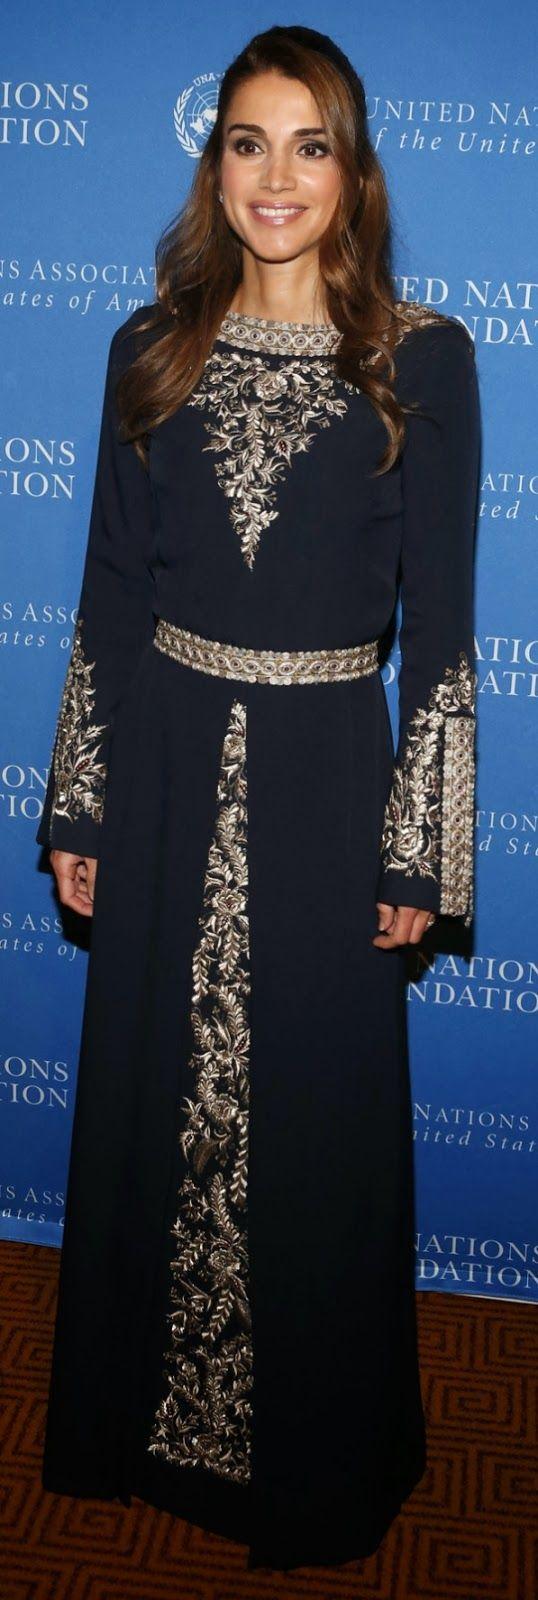 Queen Rania of Jordan wearing a kaftan